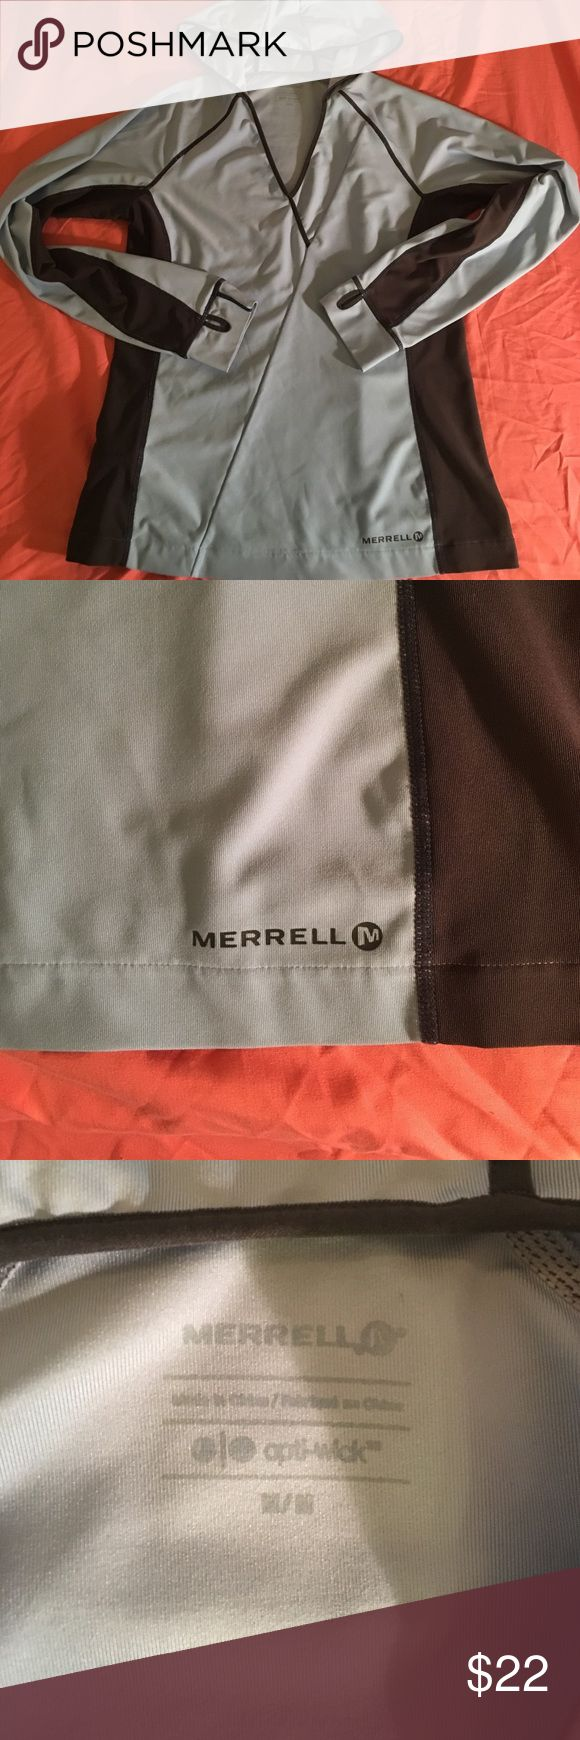 Merrell hoodie Grey and blue women's merrell hoodie size M Merrell Tops Sweatshirts & Hoodies